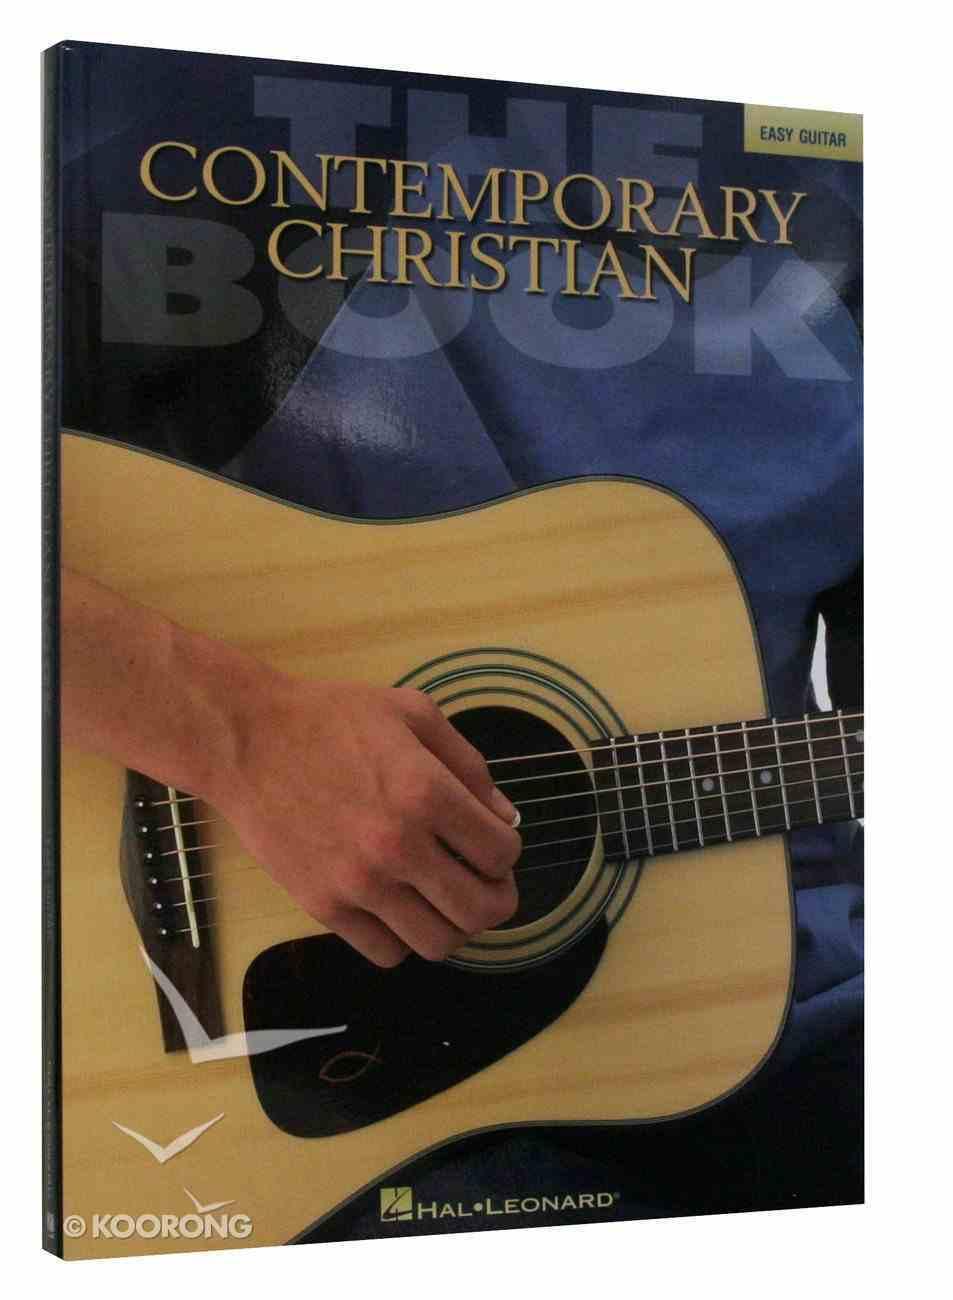 Contemporary Christian Music Book - Easy Guitar (Music Book) Paperback